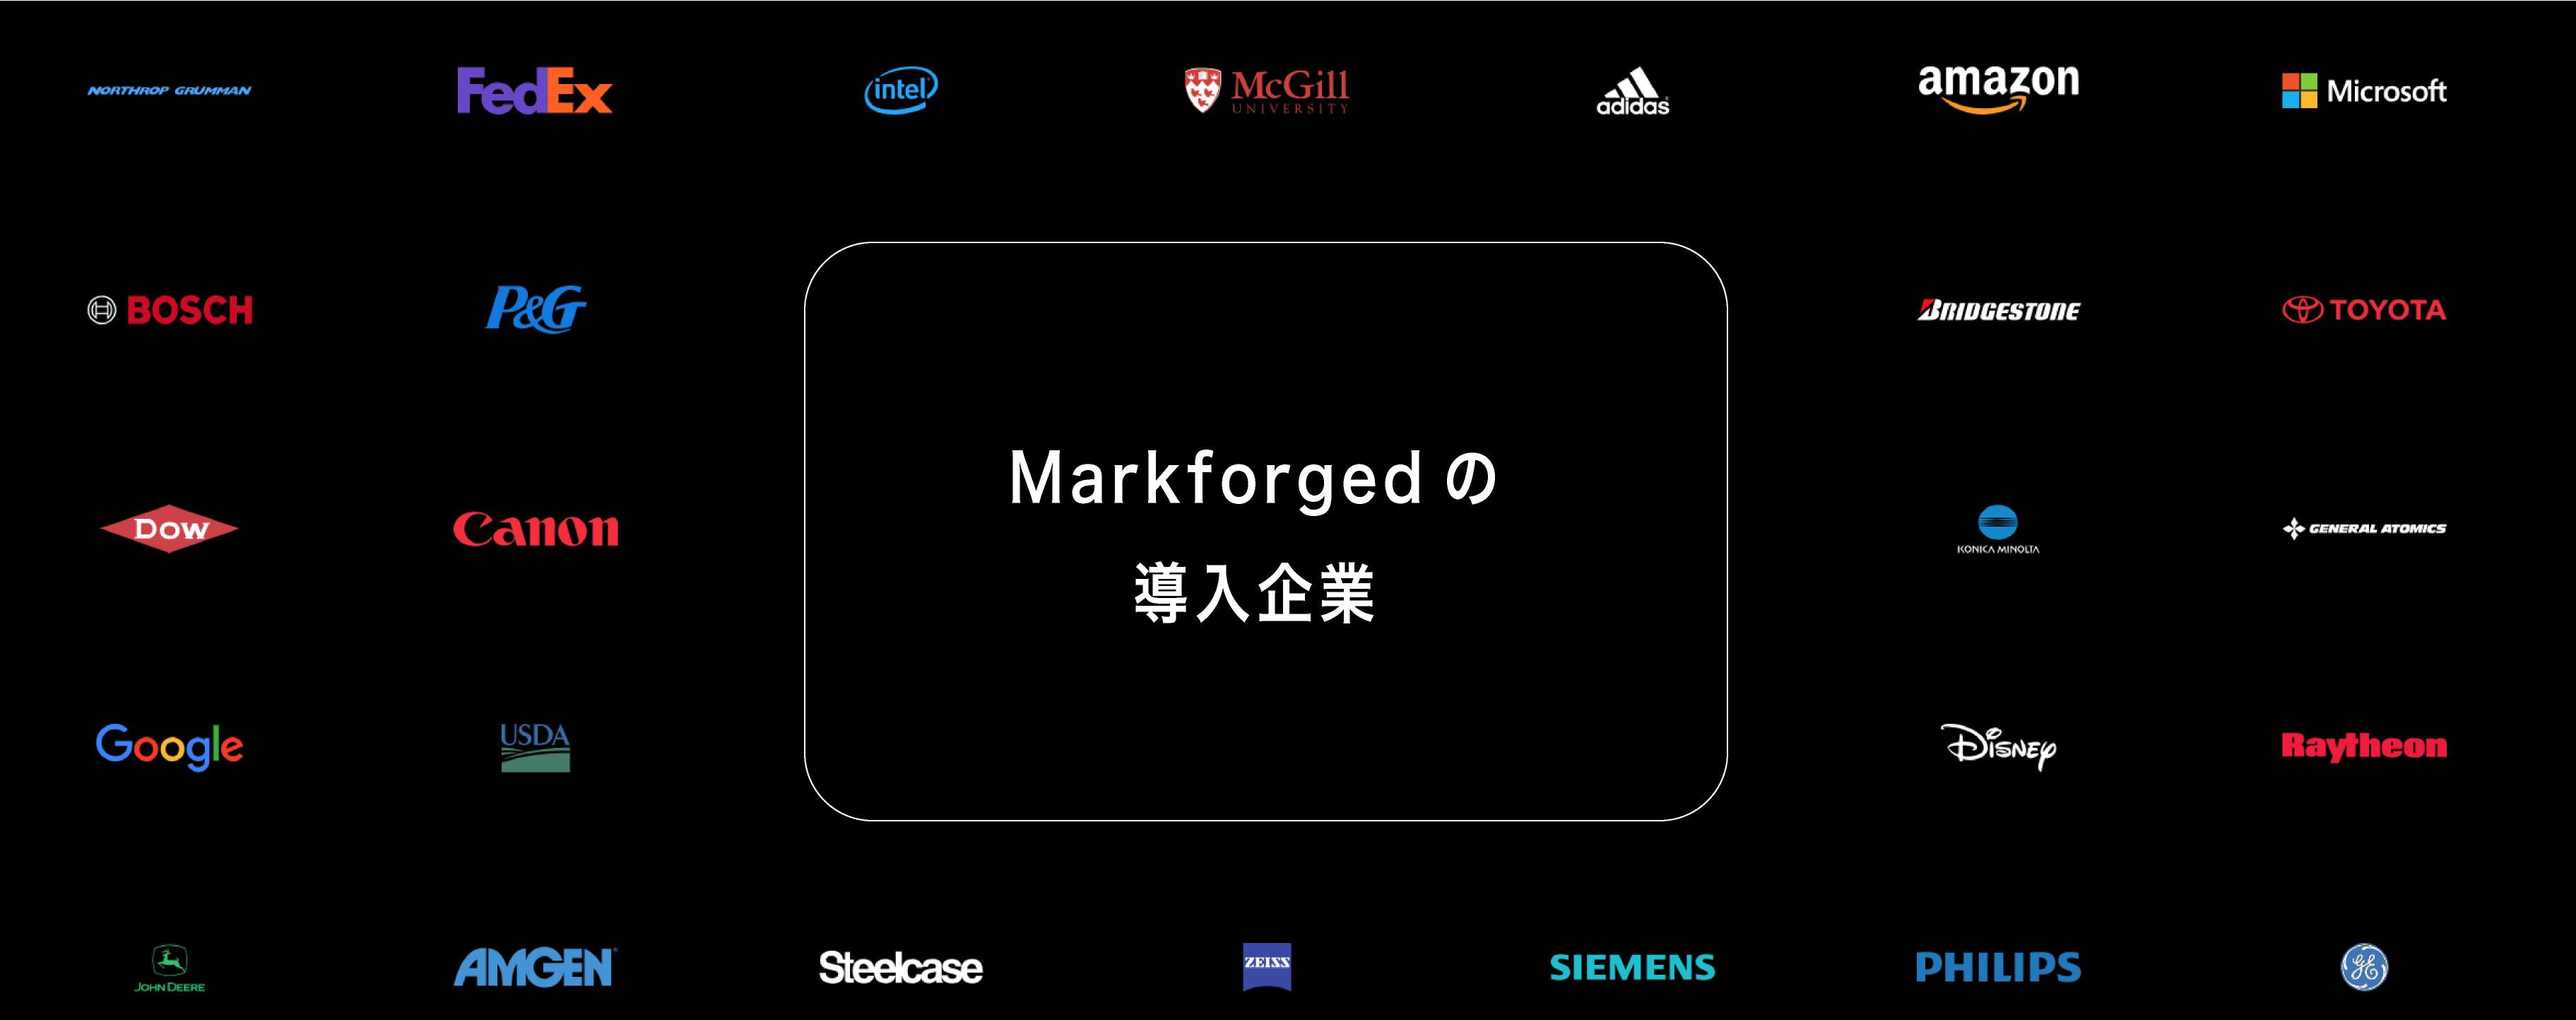 Markforged 導入事業